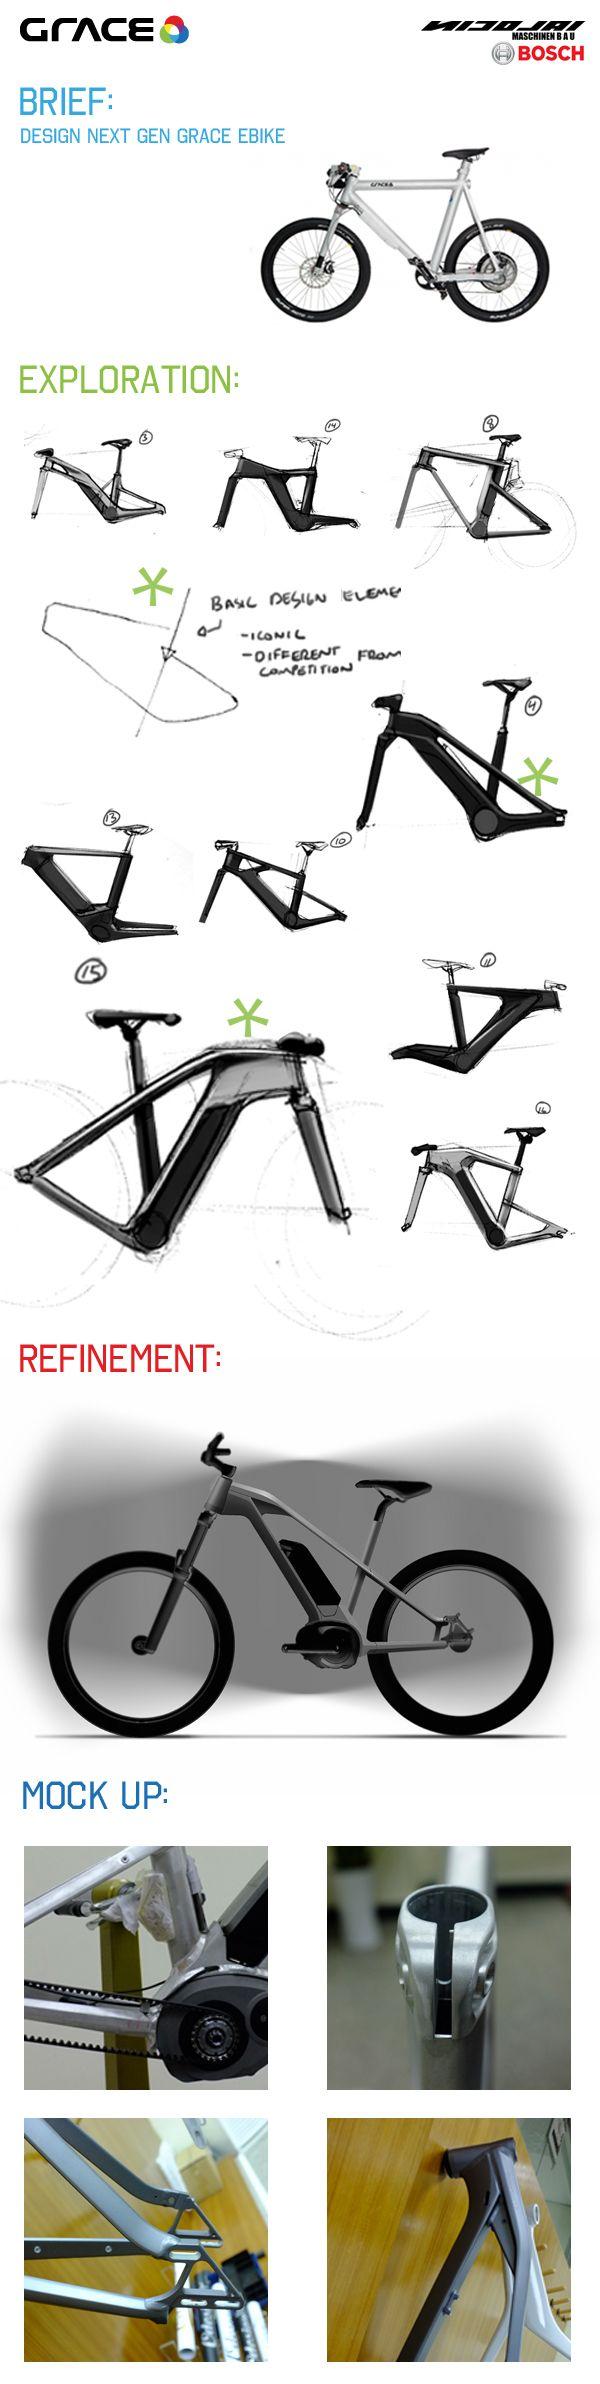 GRACE URBAN MX2 E-Bike on Behance                                                                                                                                                                                 More